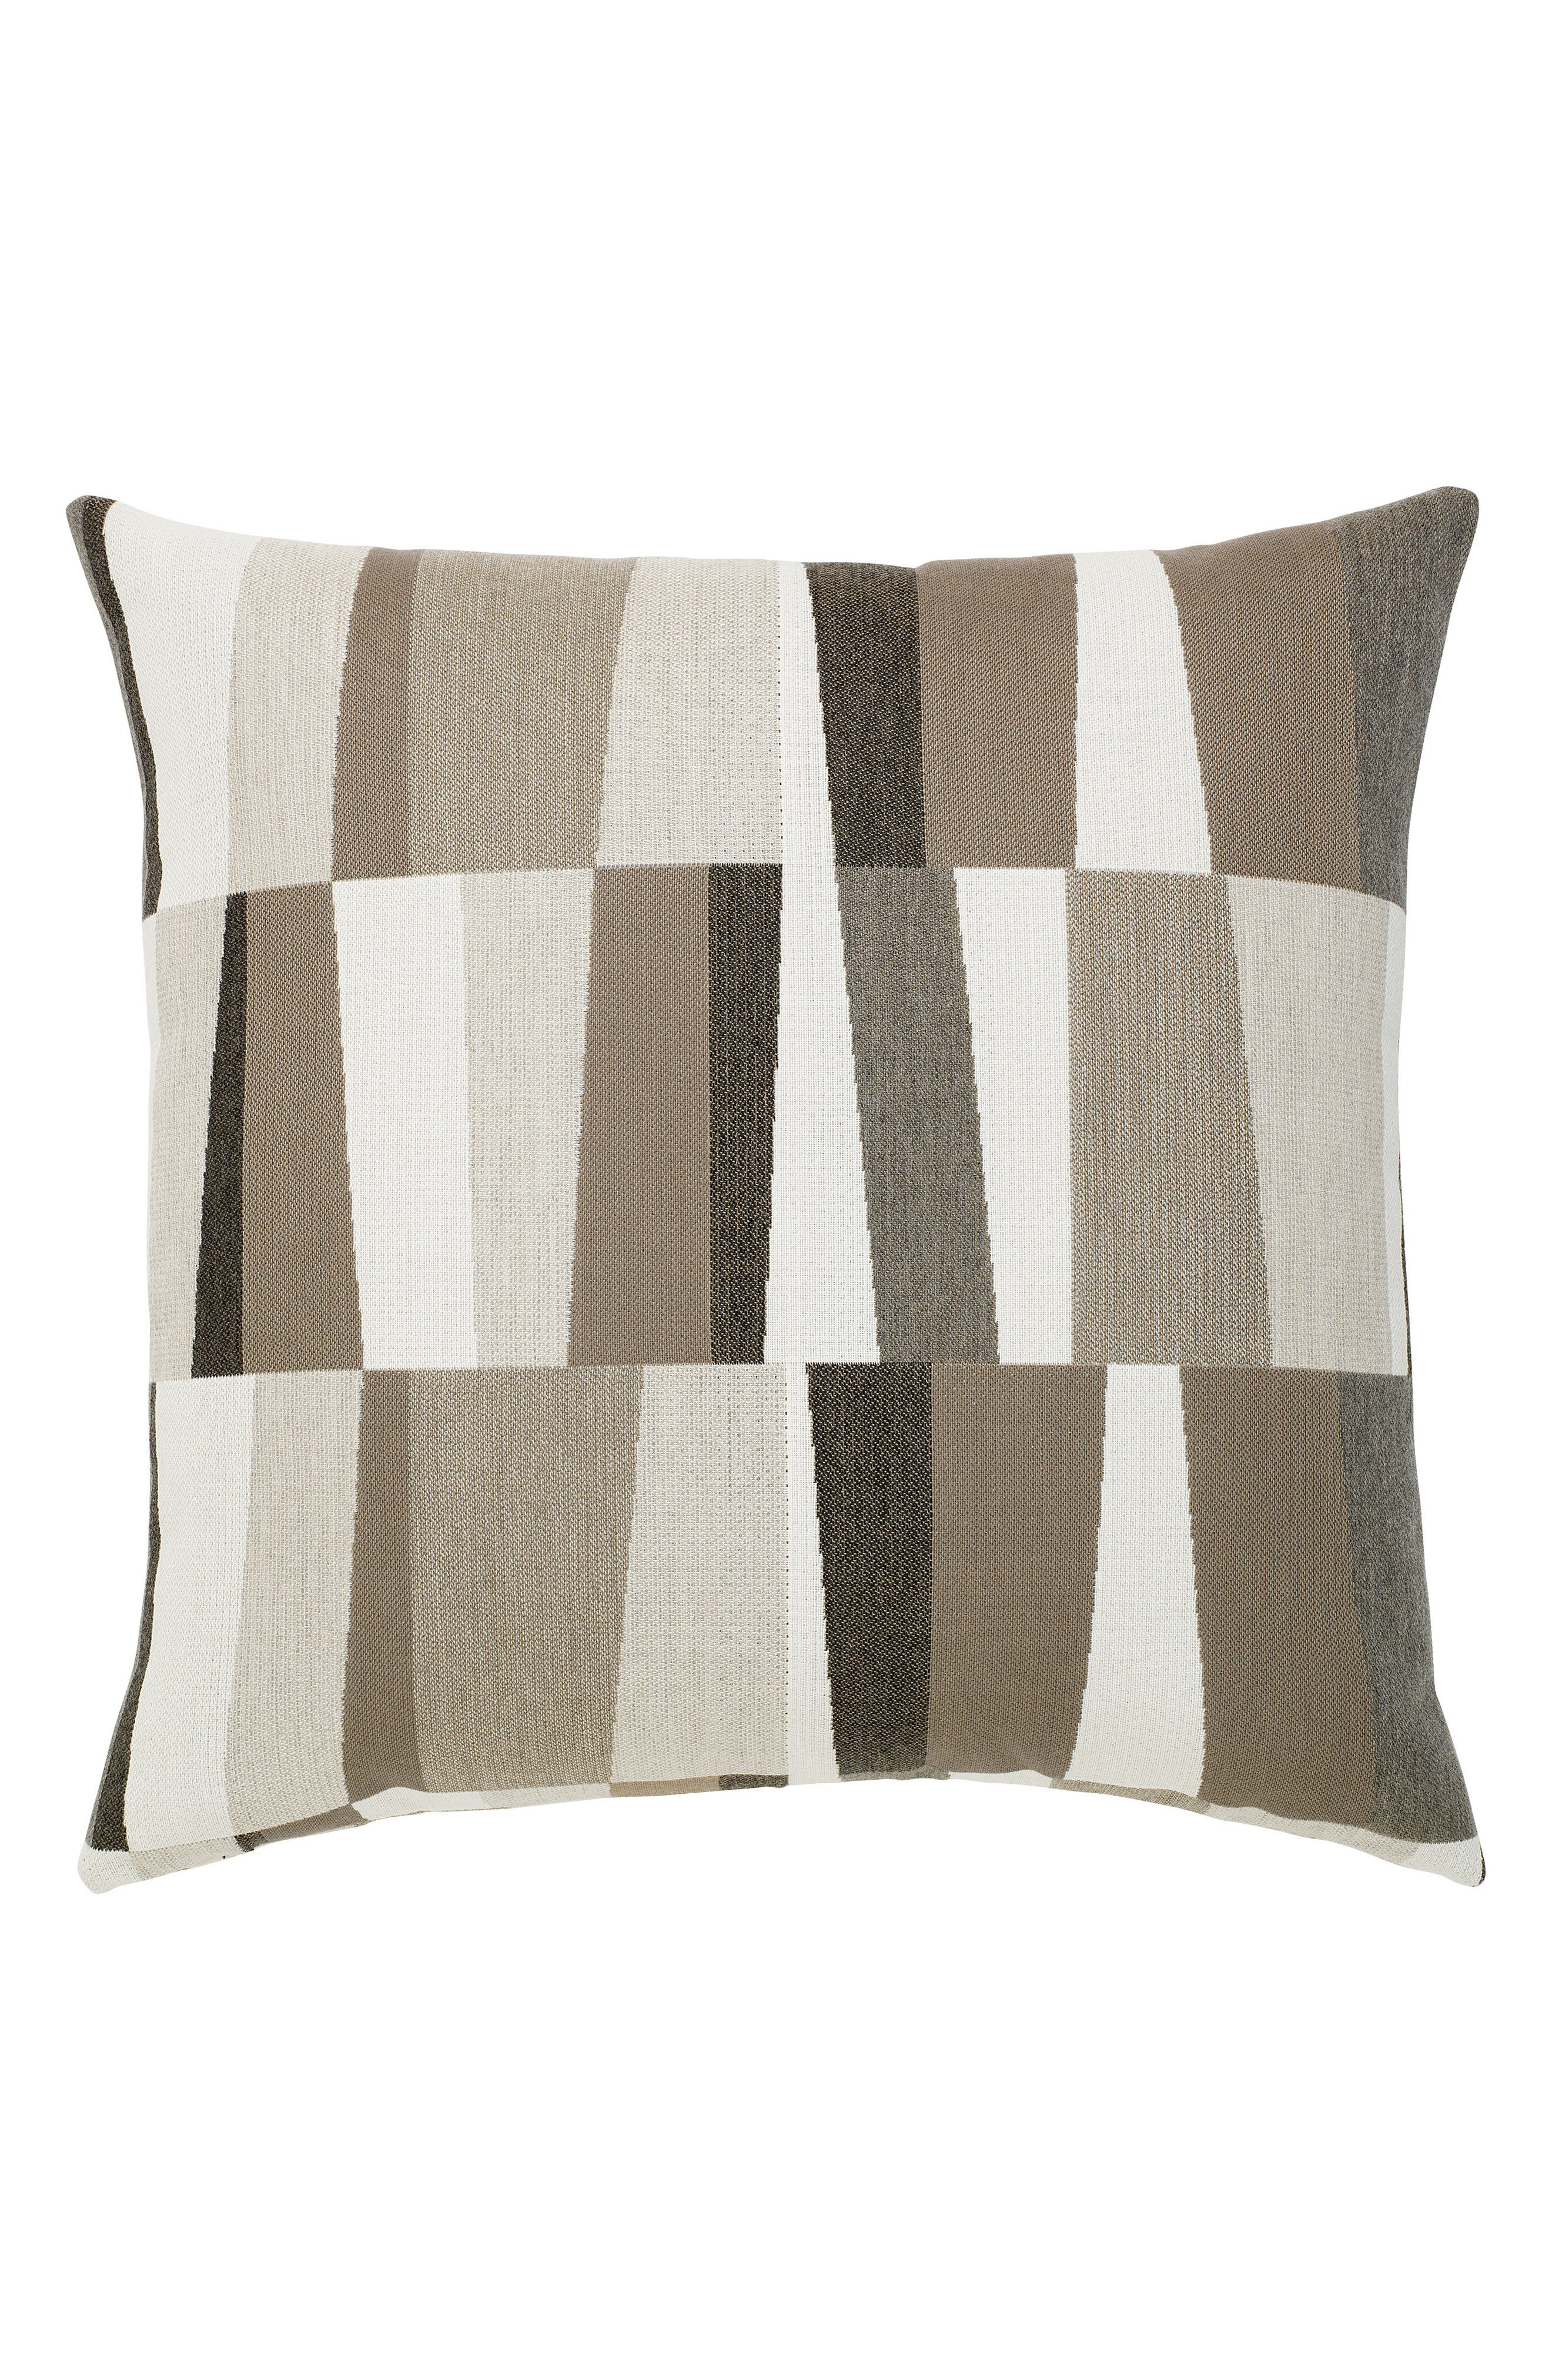 Strata Grigio Indoor/Outdoor Accent Pillow,                             Main thumbnail 1, color,                             GREY/ BROWN